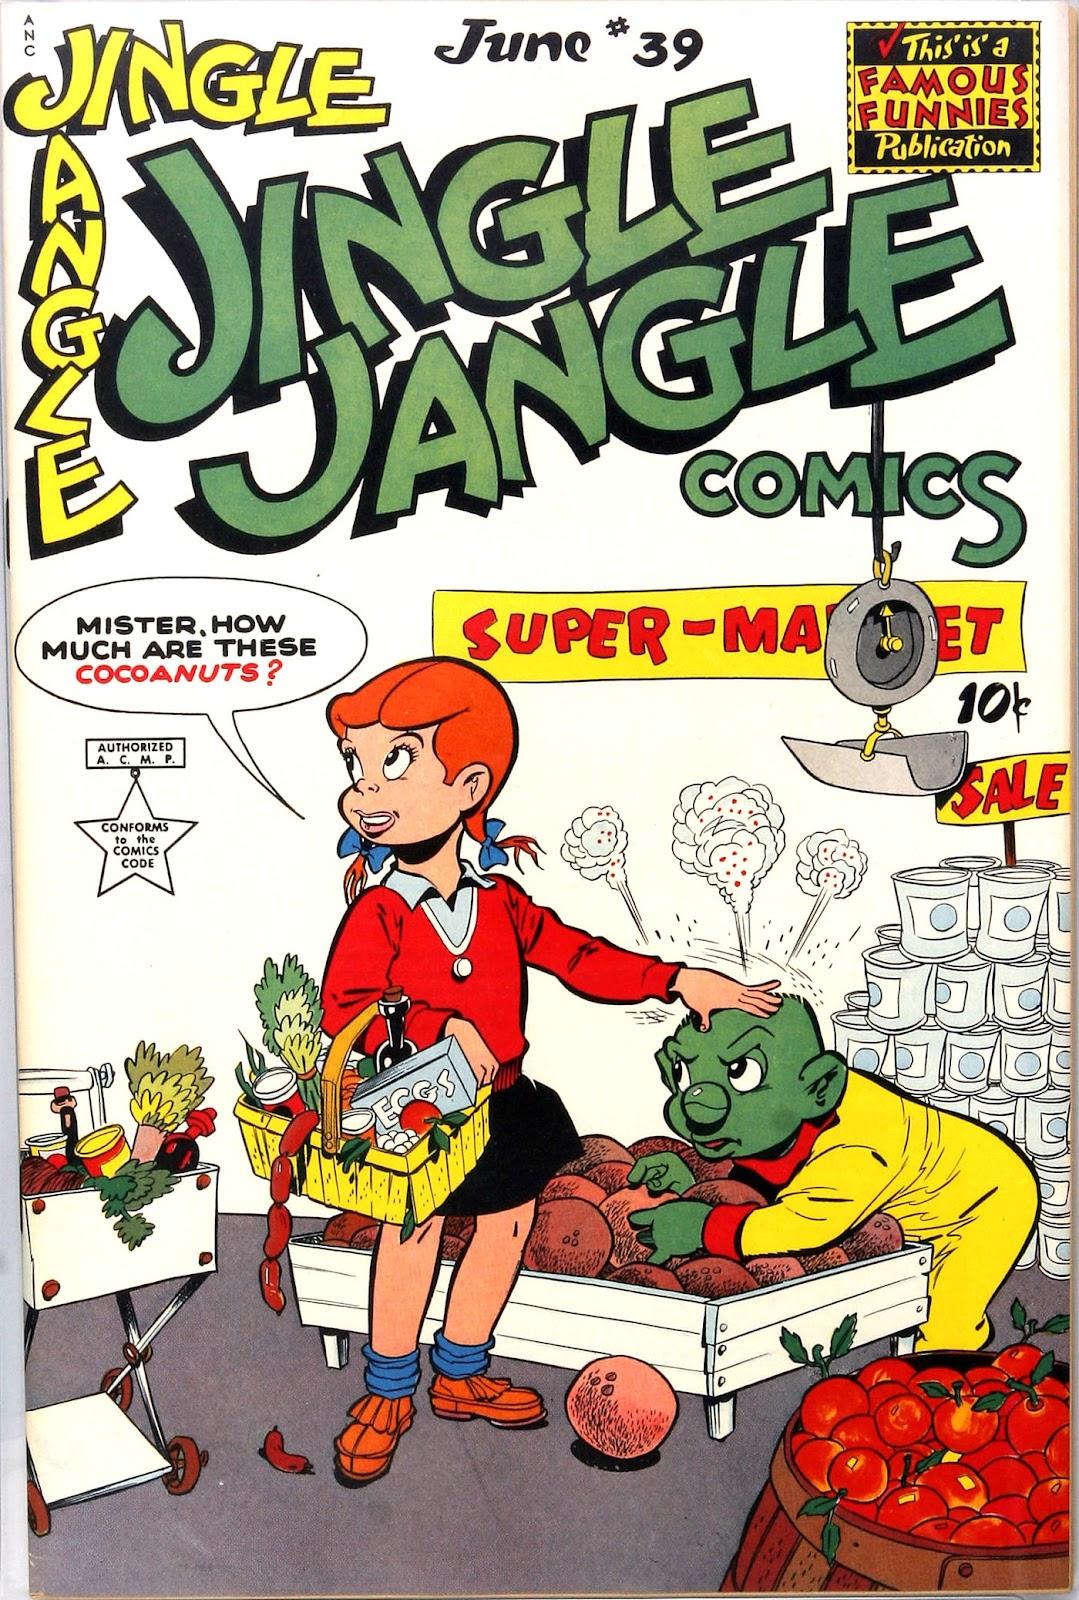 Jingle Jangle Comics issue 39 - Page 1